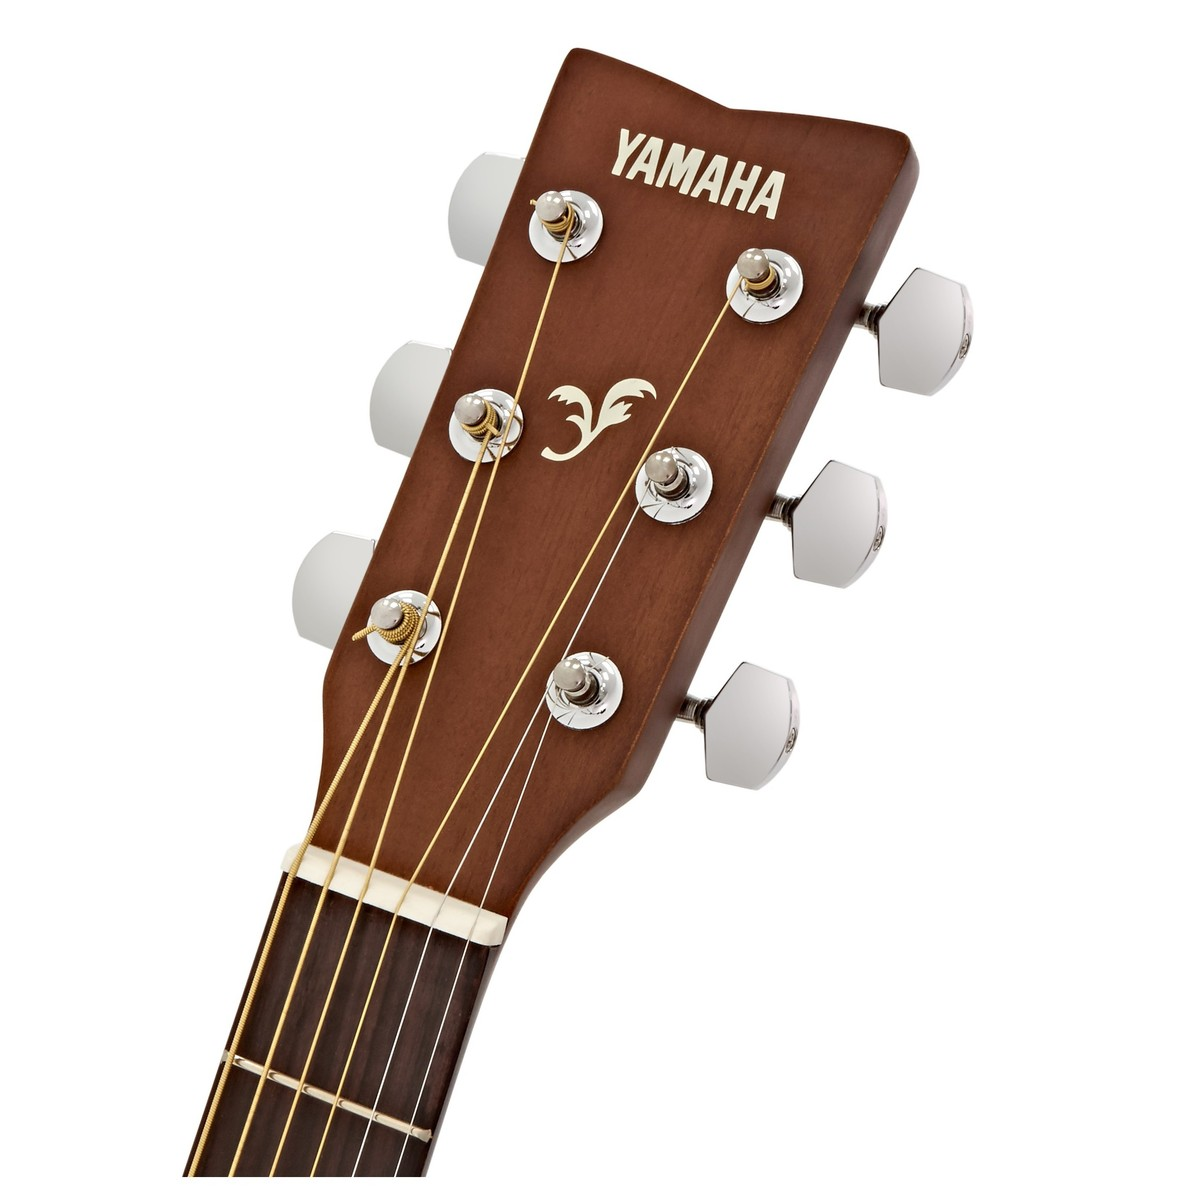 Yamaha f310p2 acoustic guitar beginners pack at for Acoustic yamaha guitar